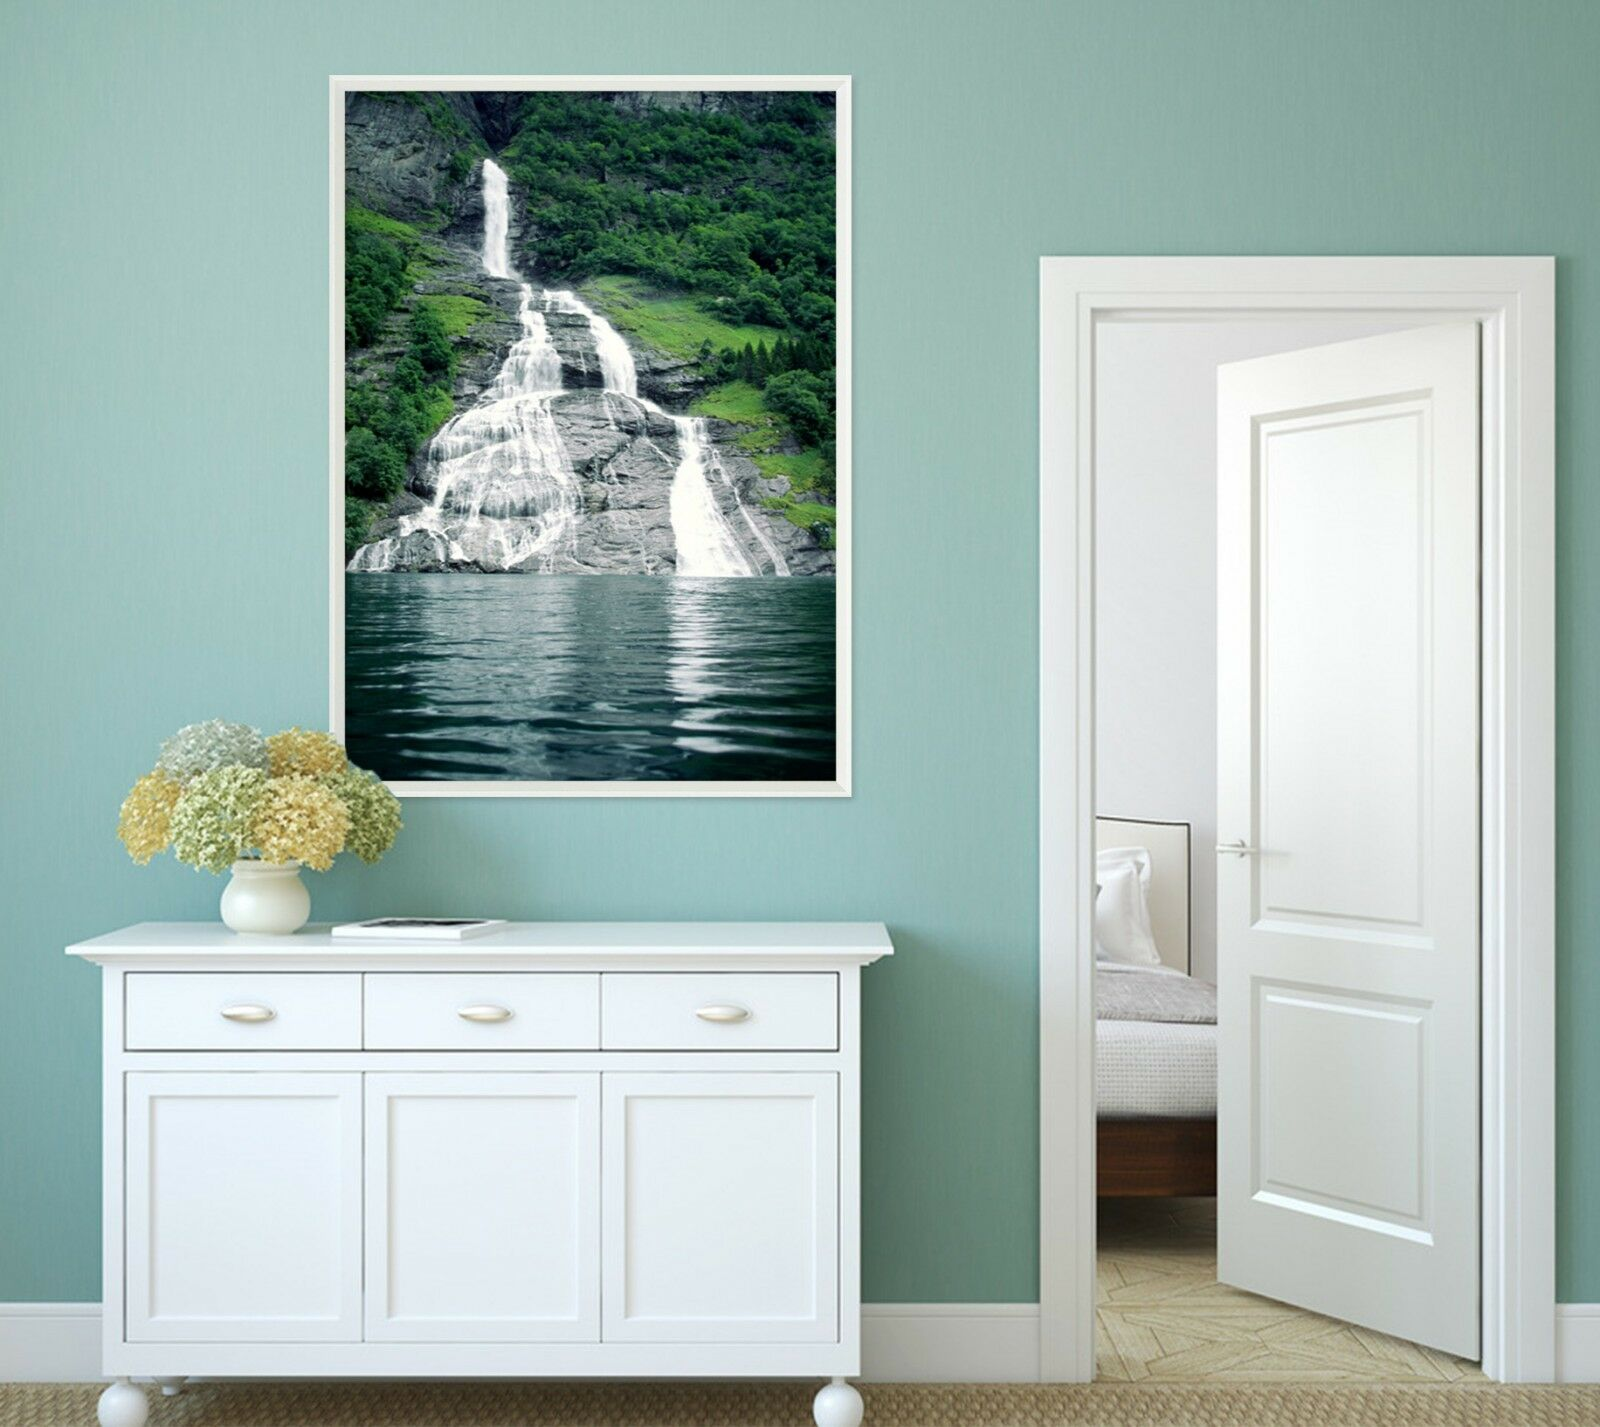 3D Cascada Cliff 32 Enmarcado Cartel Decoración del Hogar Pintura de Impresión Arte AJ Wallpaper